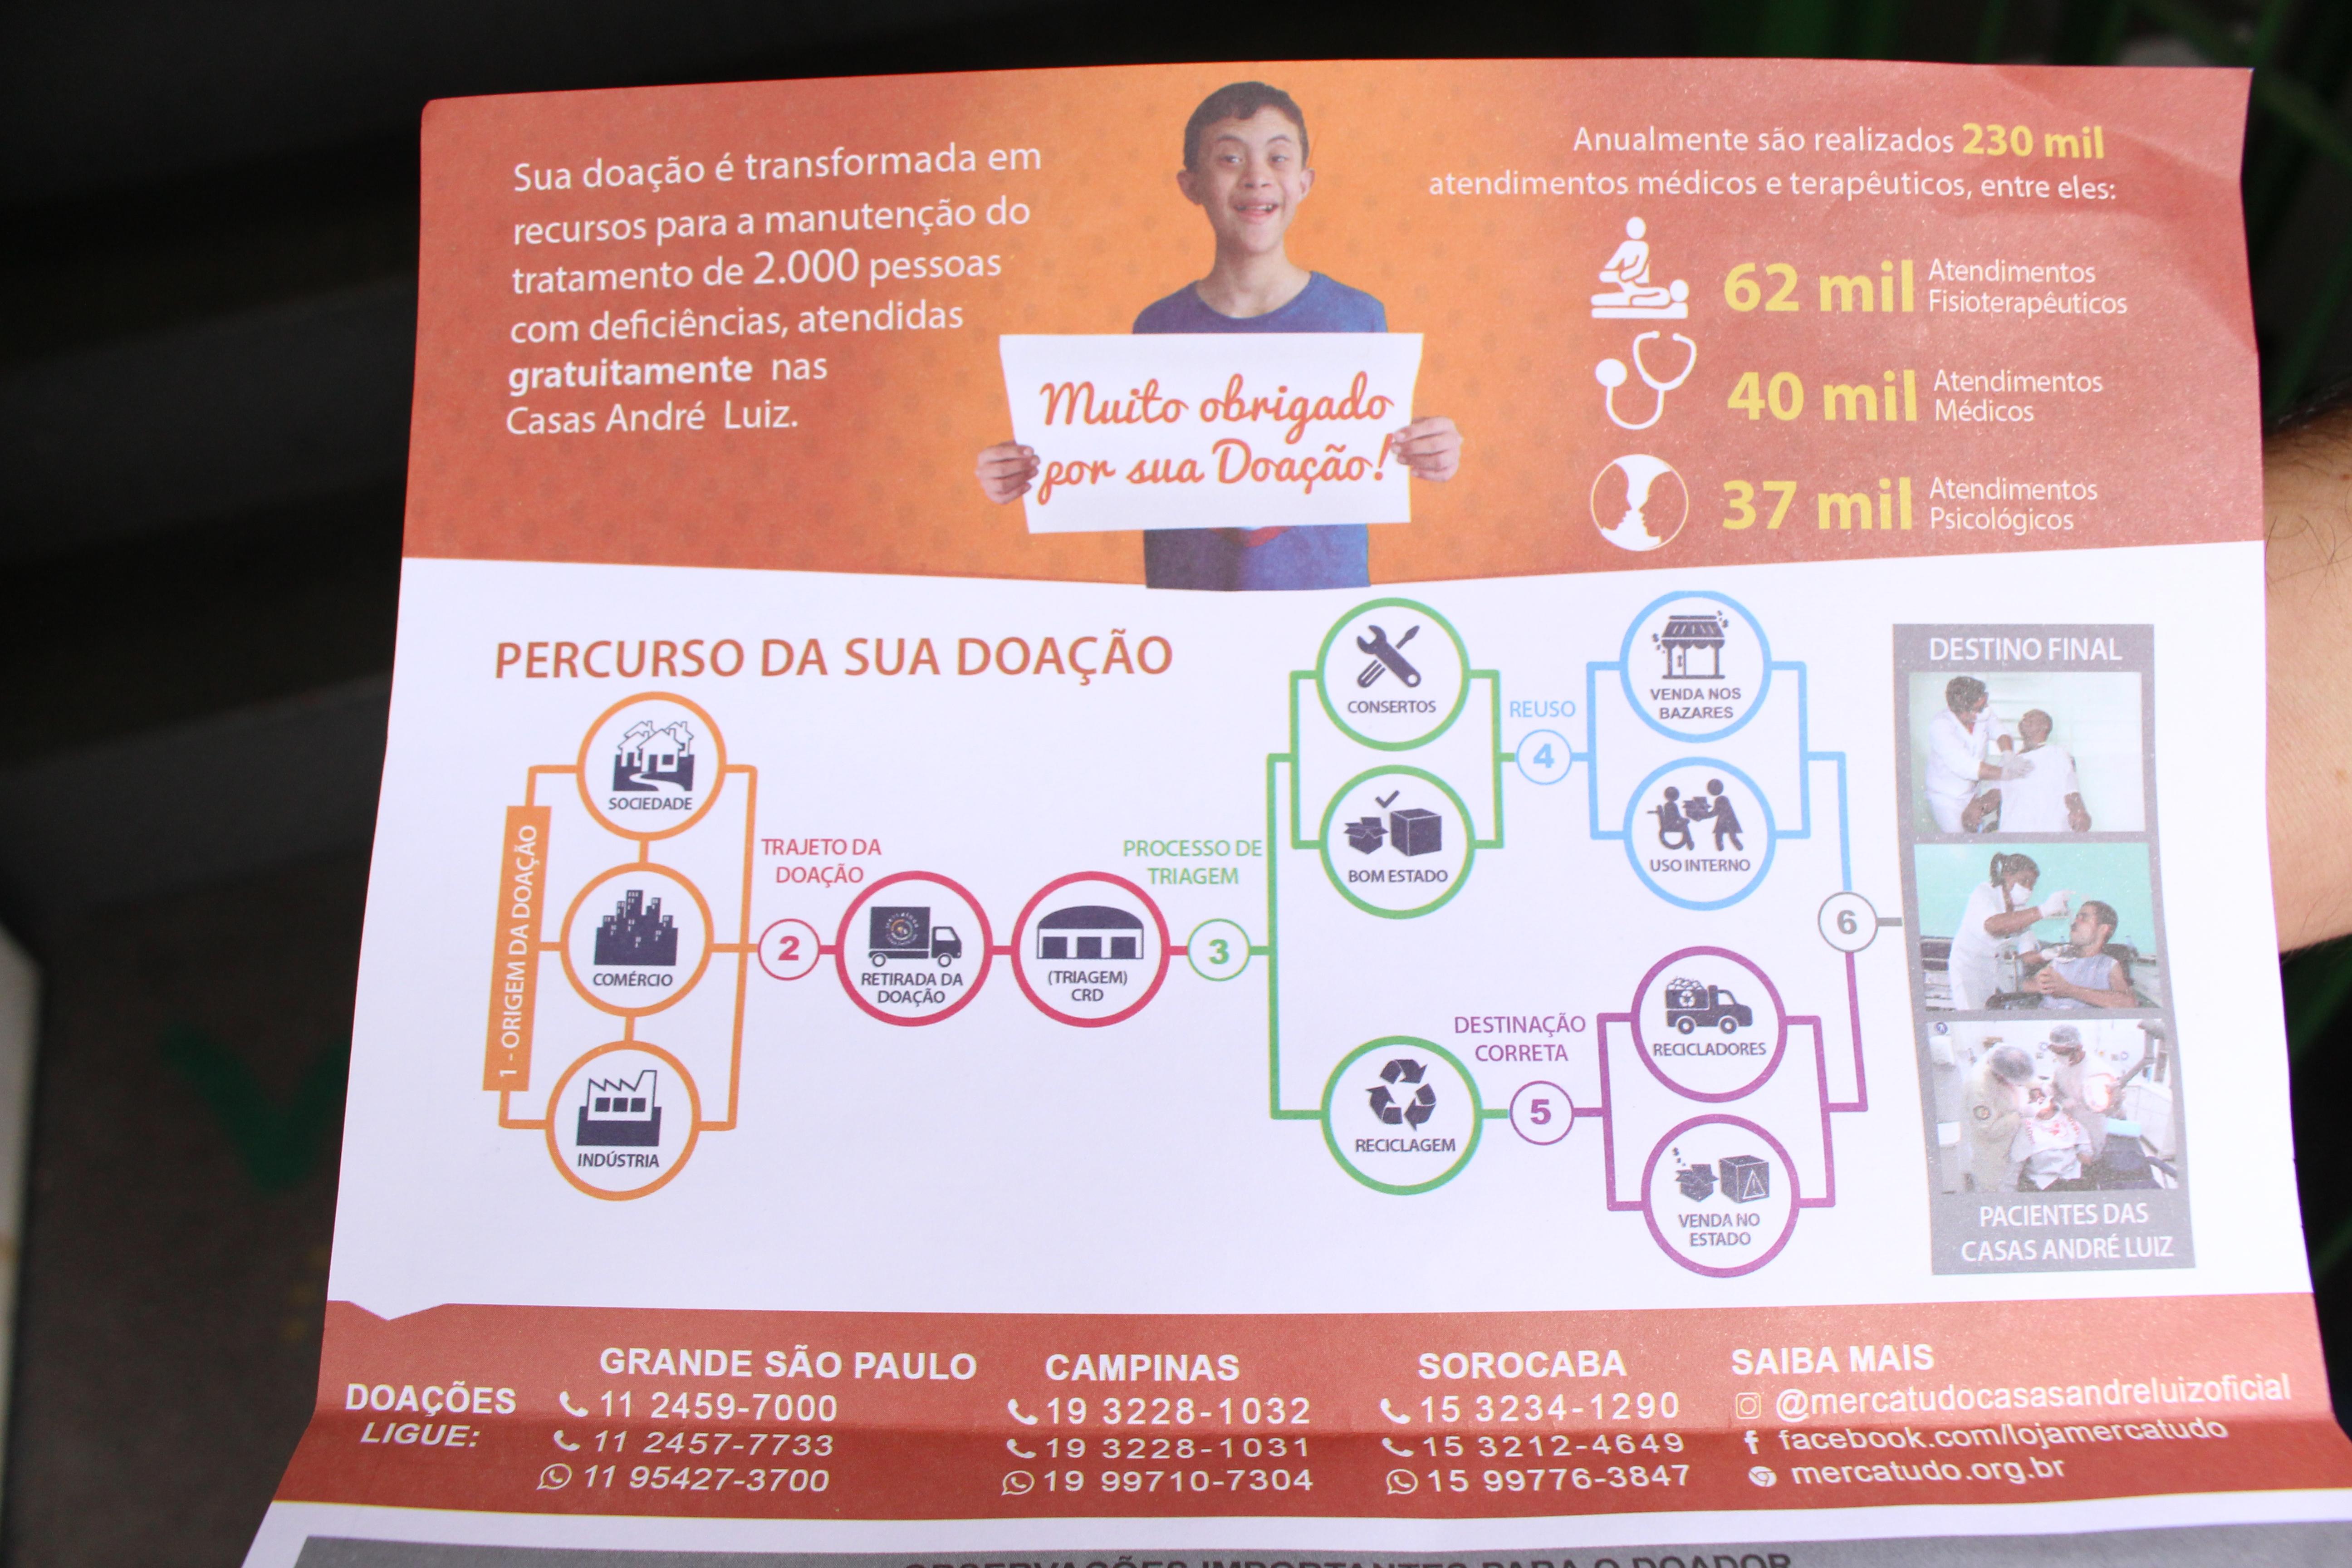 https://www.institutocimas.com.br/waUpload/img924201019122019114308.jpg